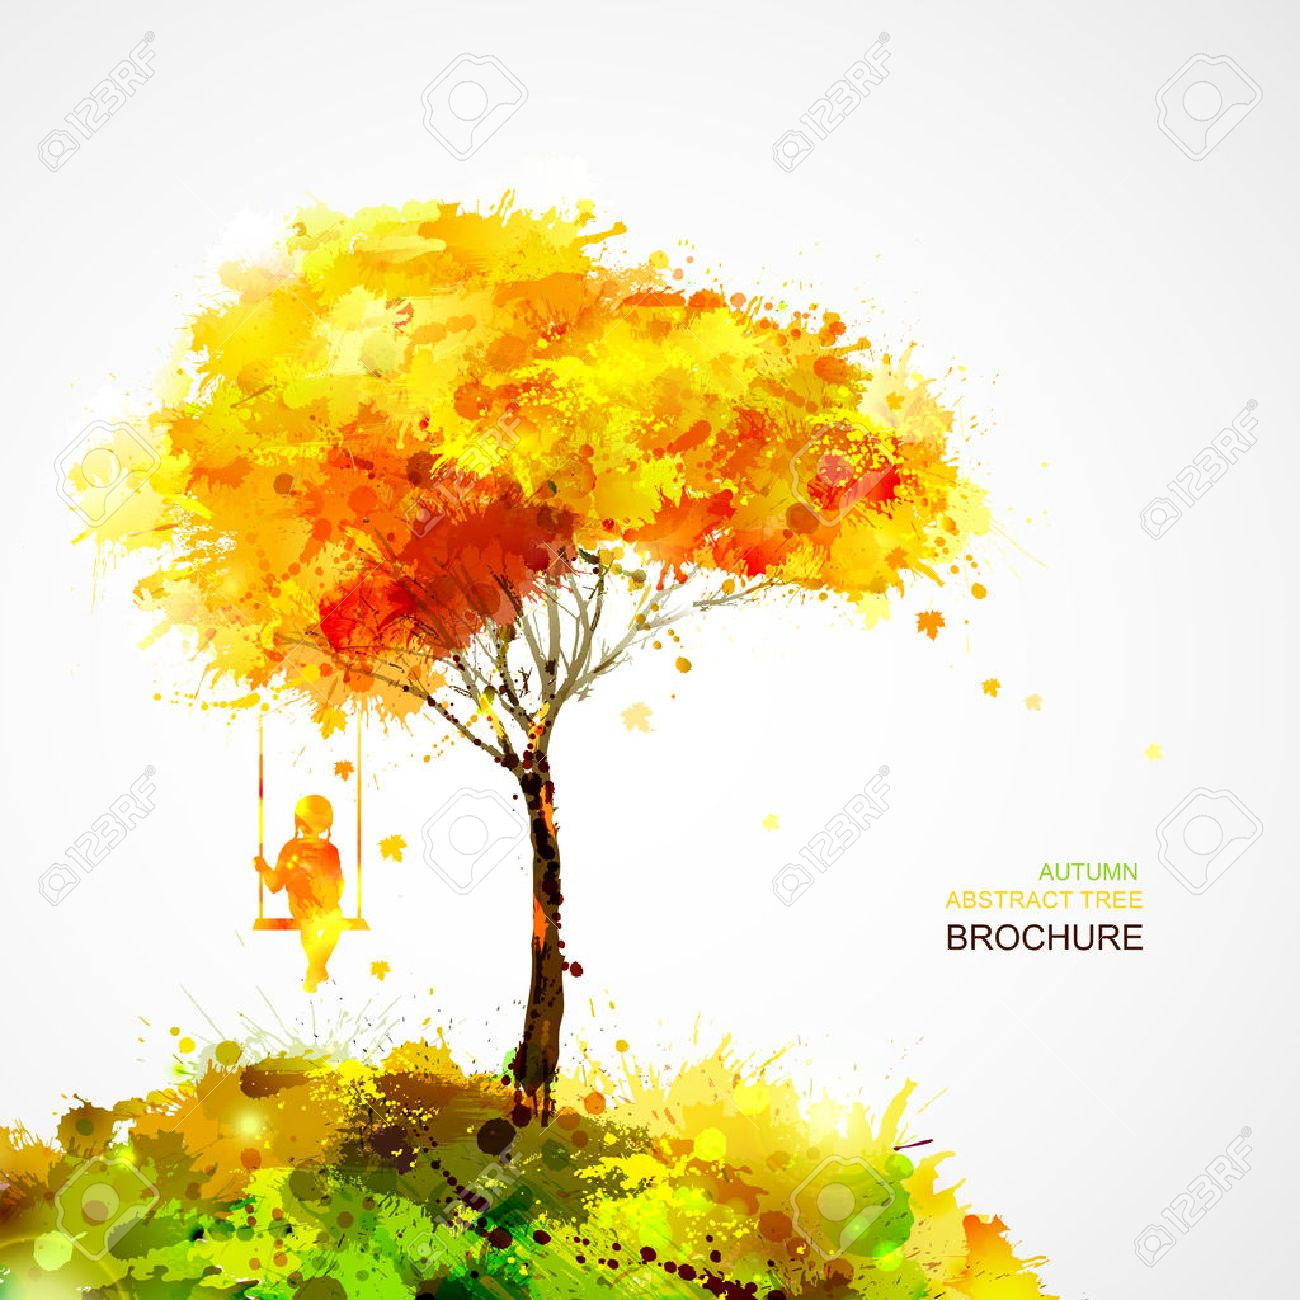 autumn tree. Dreaming girl on swing Stock Vector - 36225871